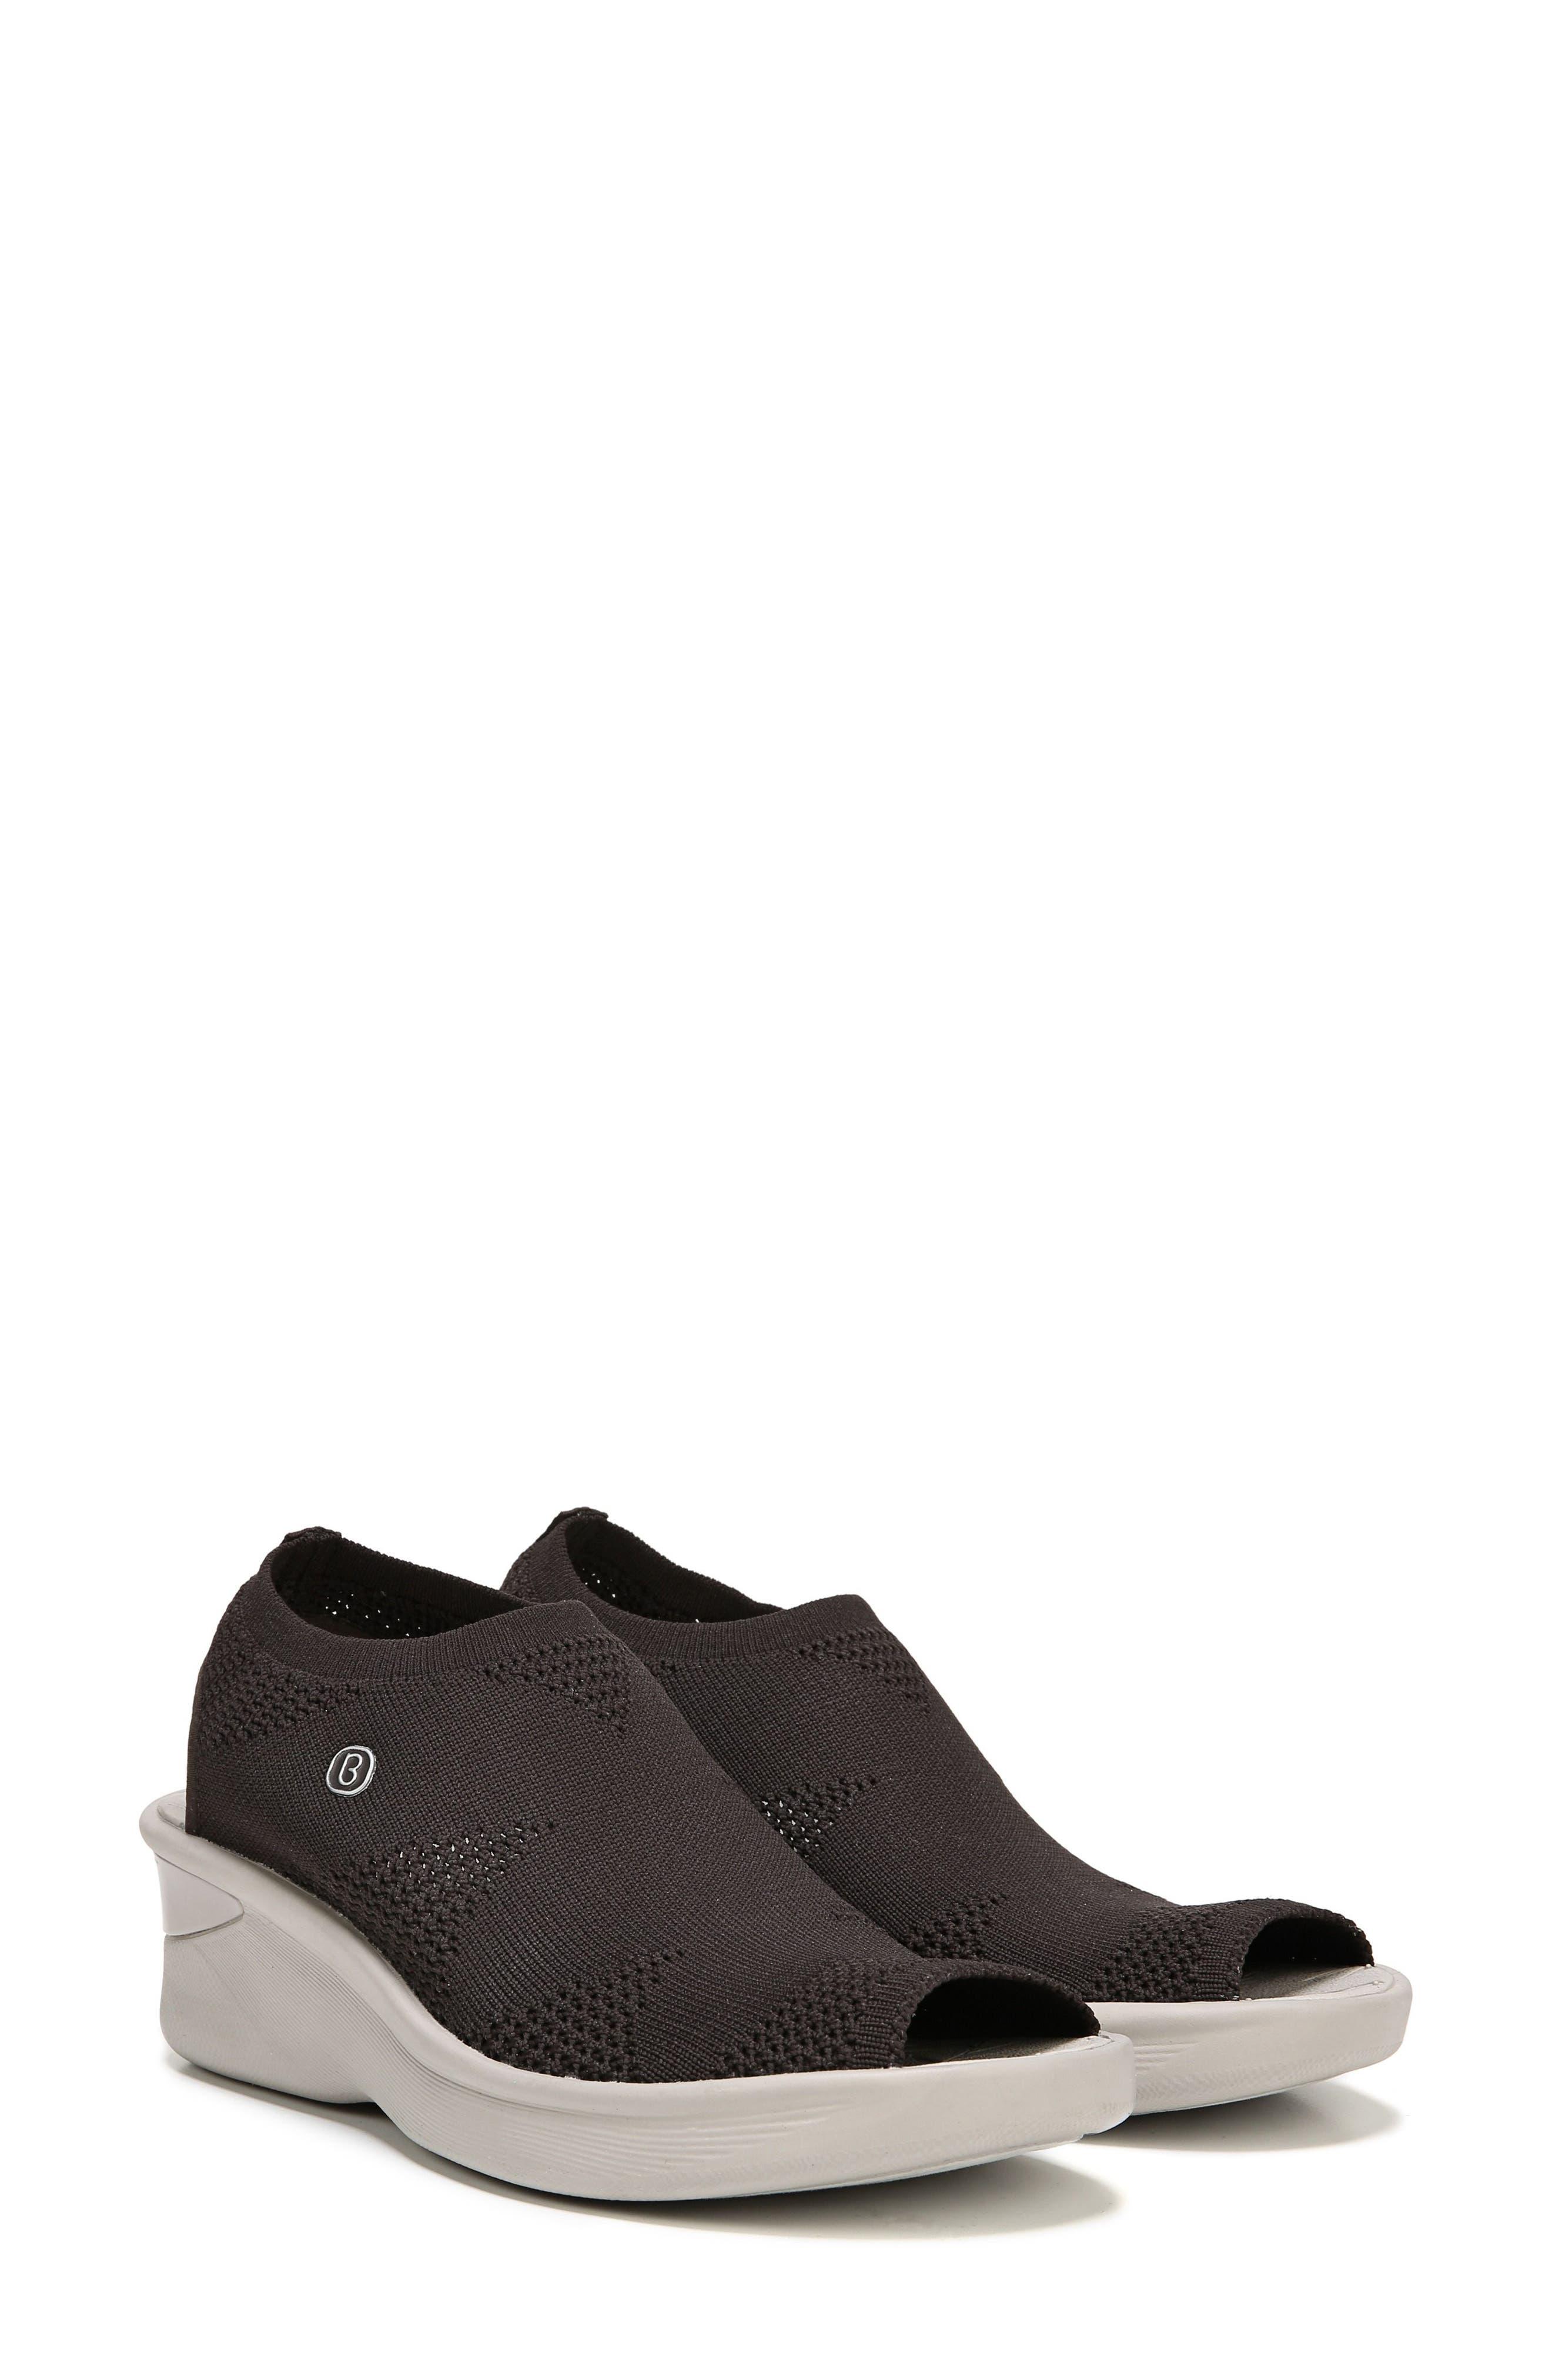 Secret Peep Toe Knit Sneaker,                             Alternate thumbnail 6, color,                             BROWN FABRIC